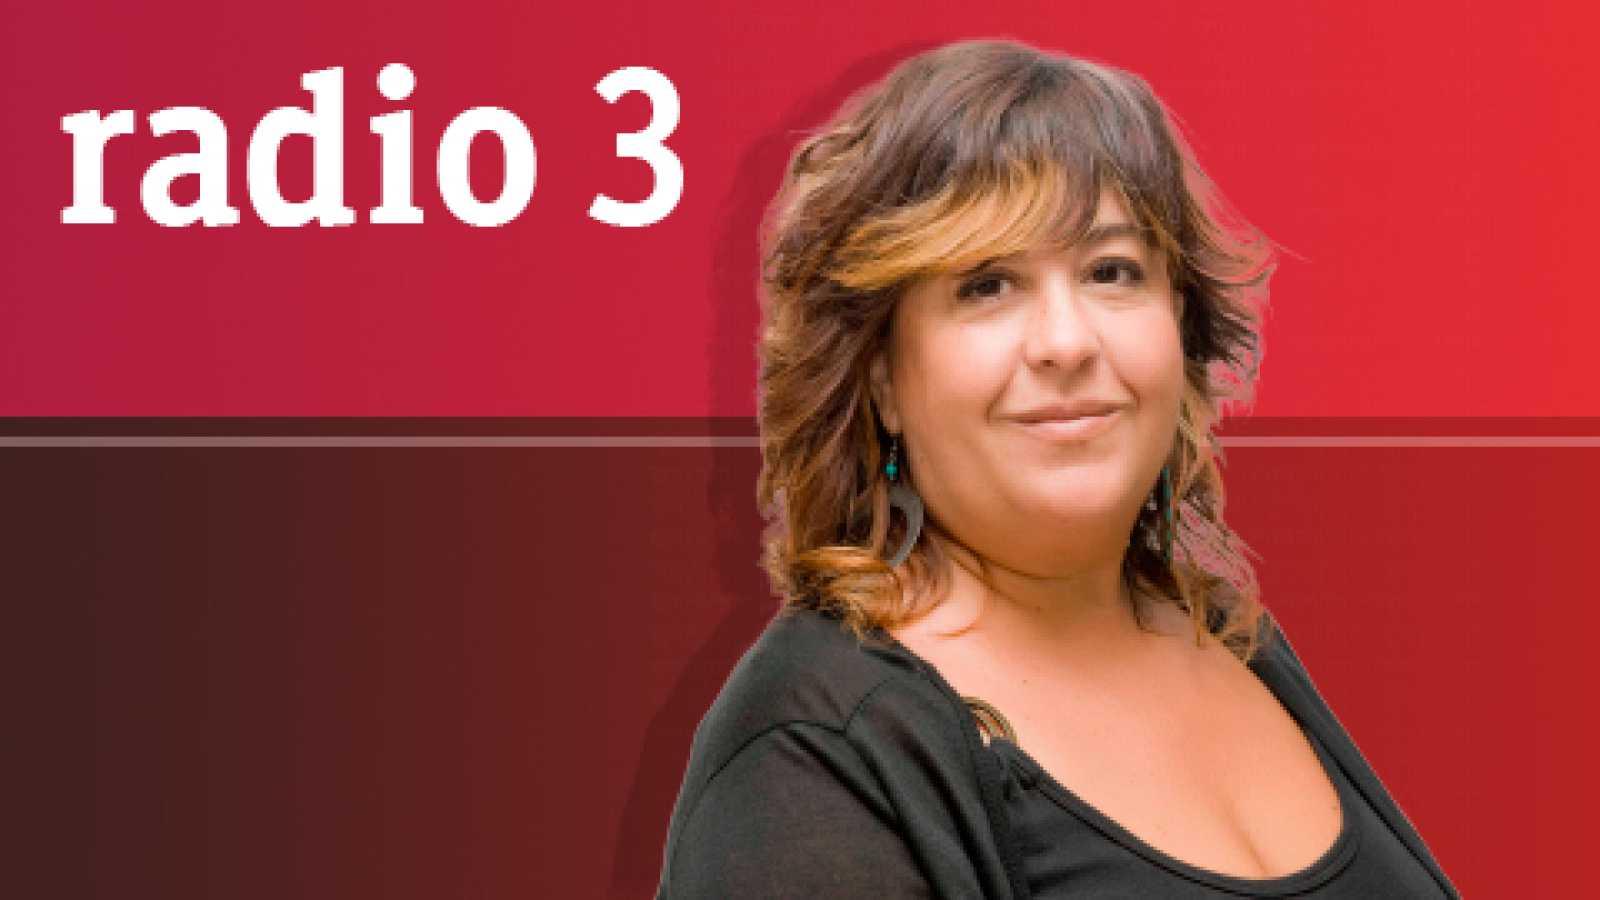 El gran quilombo - 31/10/20 - escuchar ahora